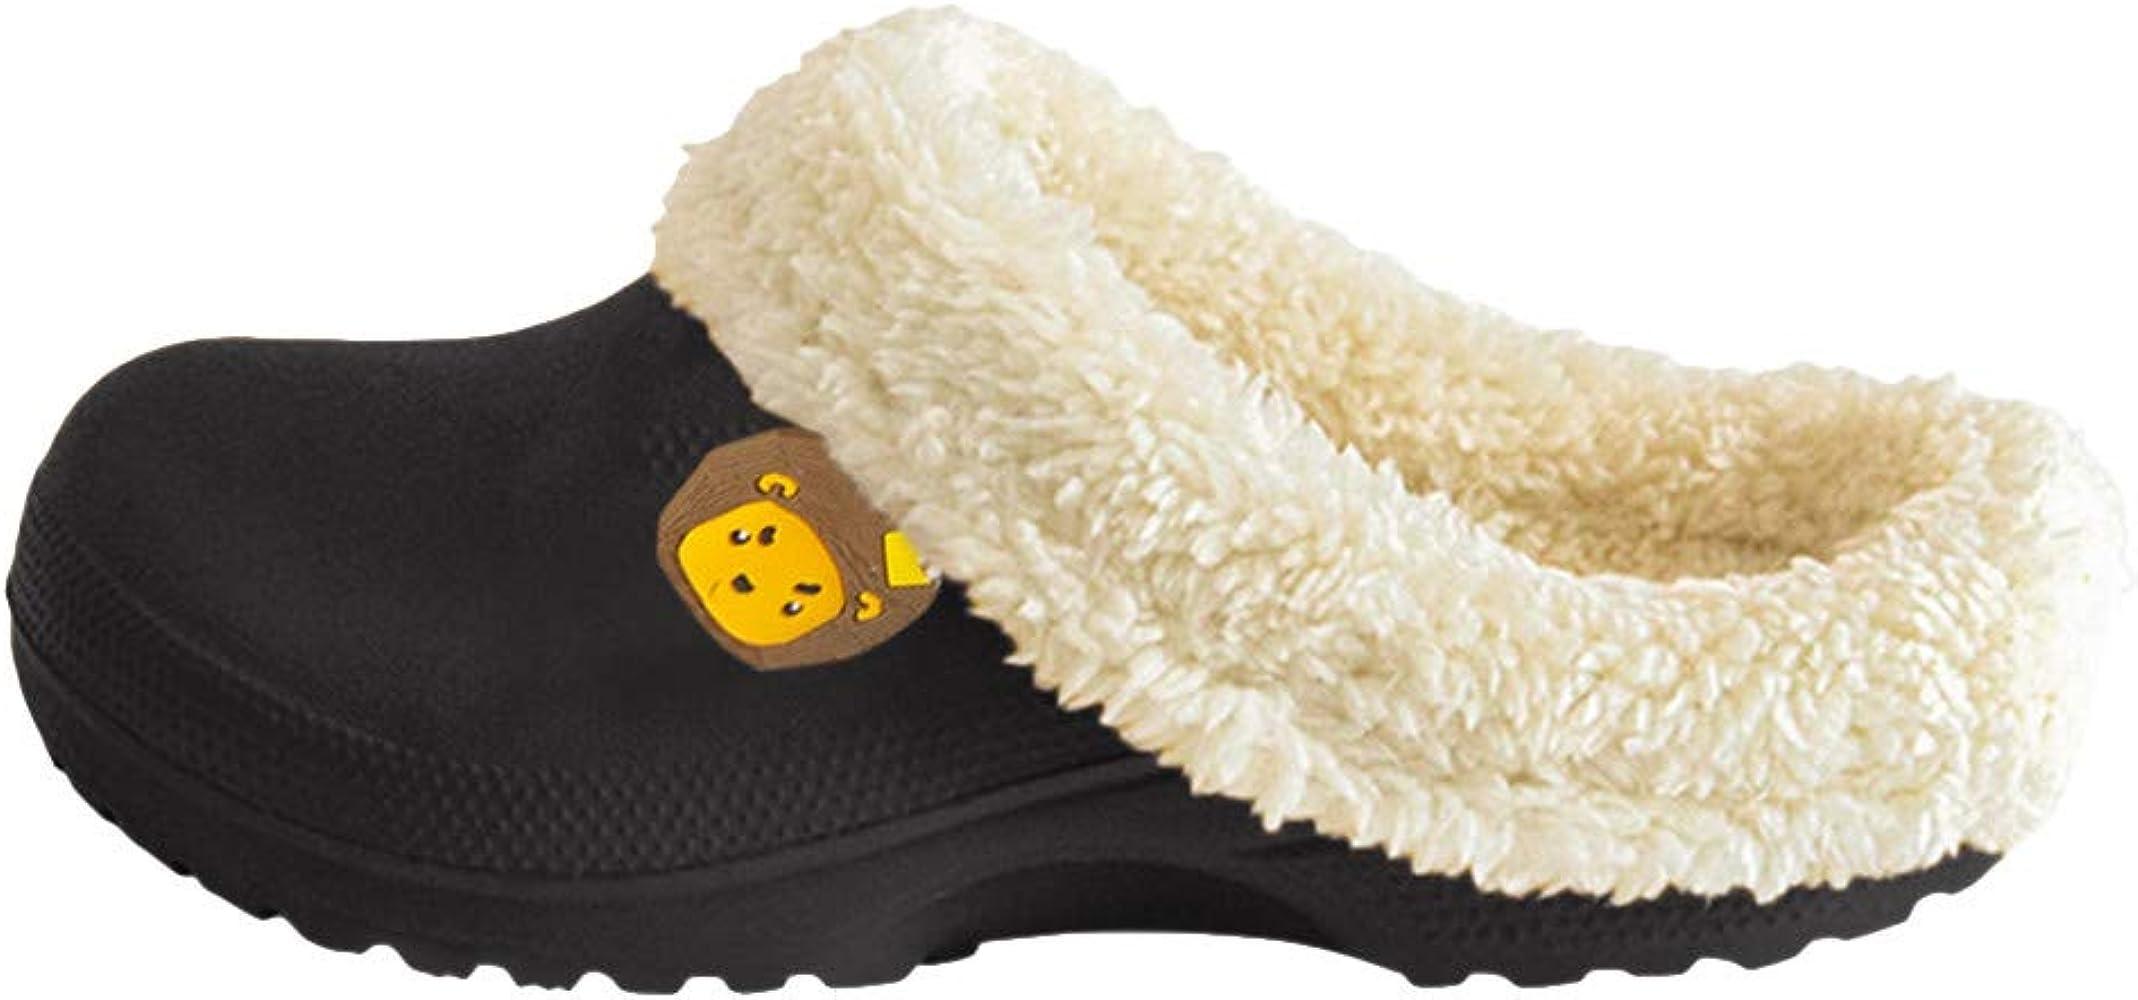 Amazon.com: Waterproof Slippers Kids